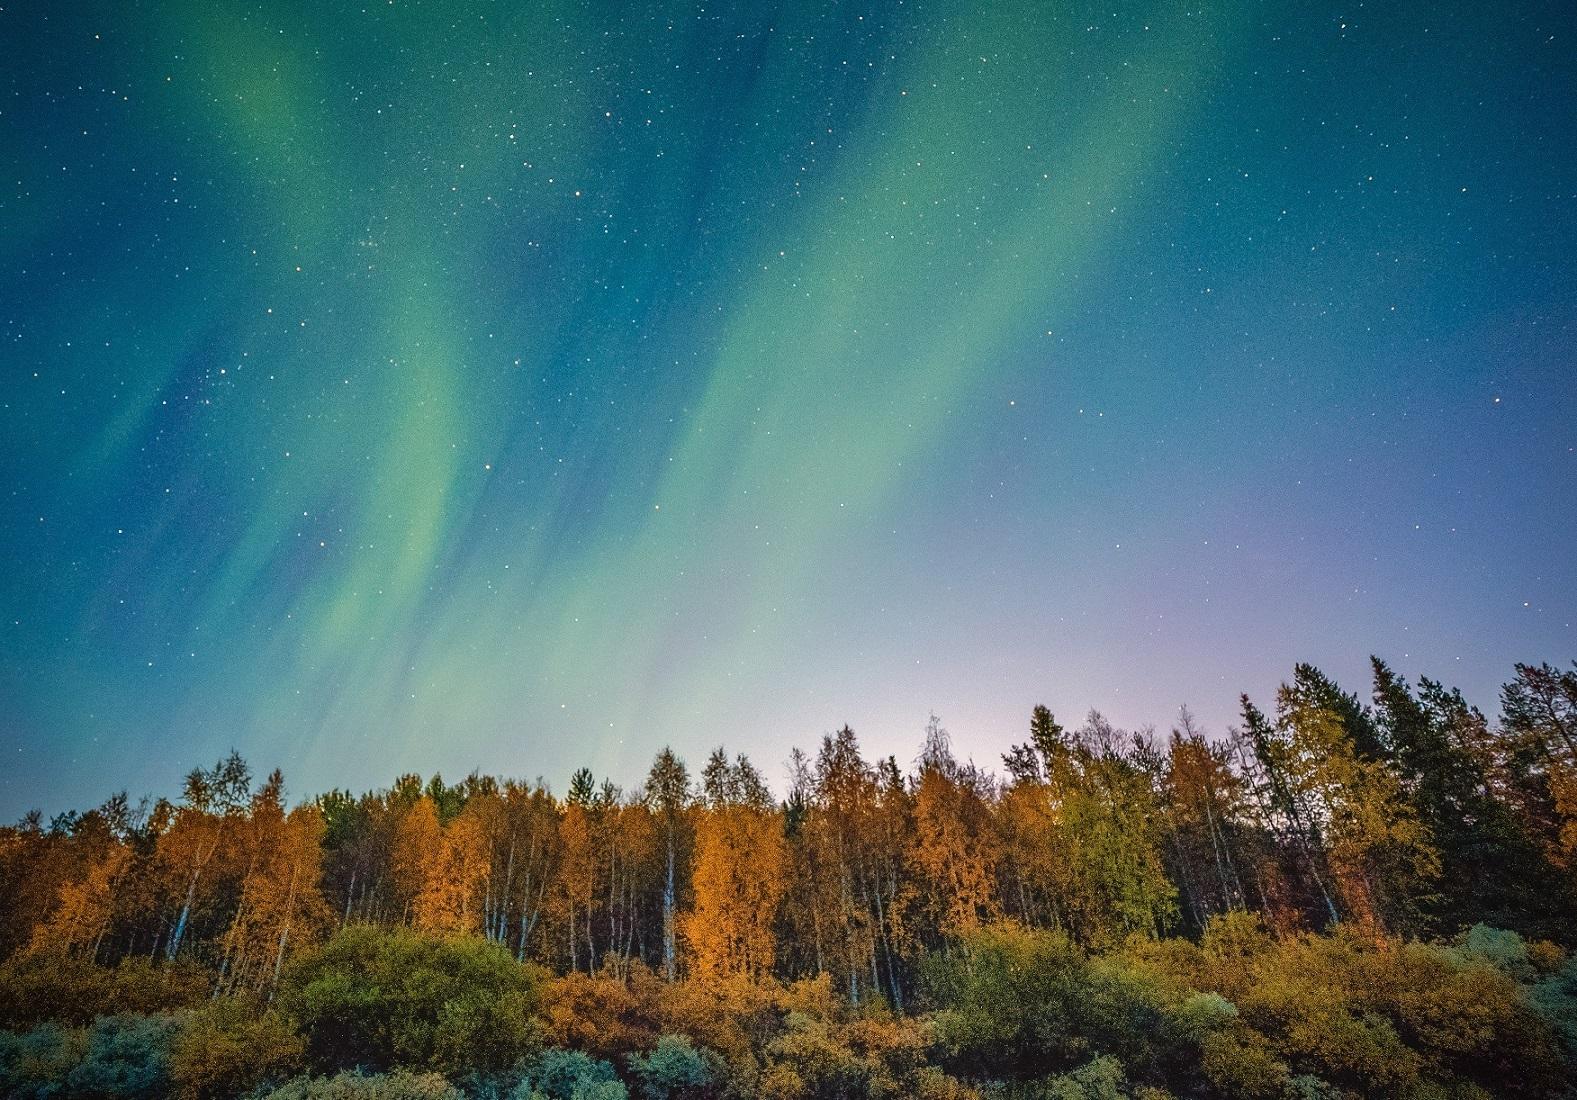 Autumn auroras 2019 3 credit Antti Pietikainen